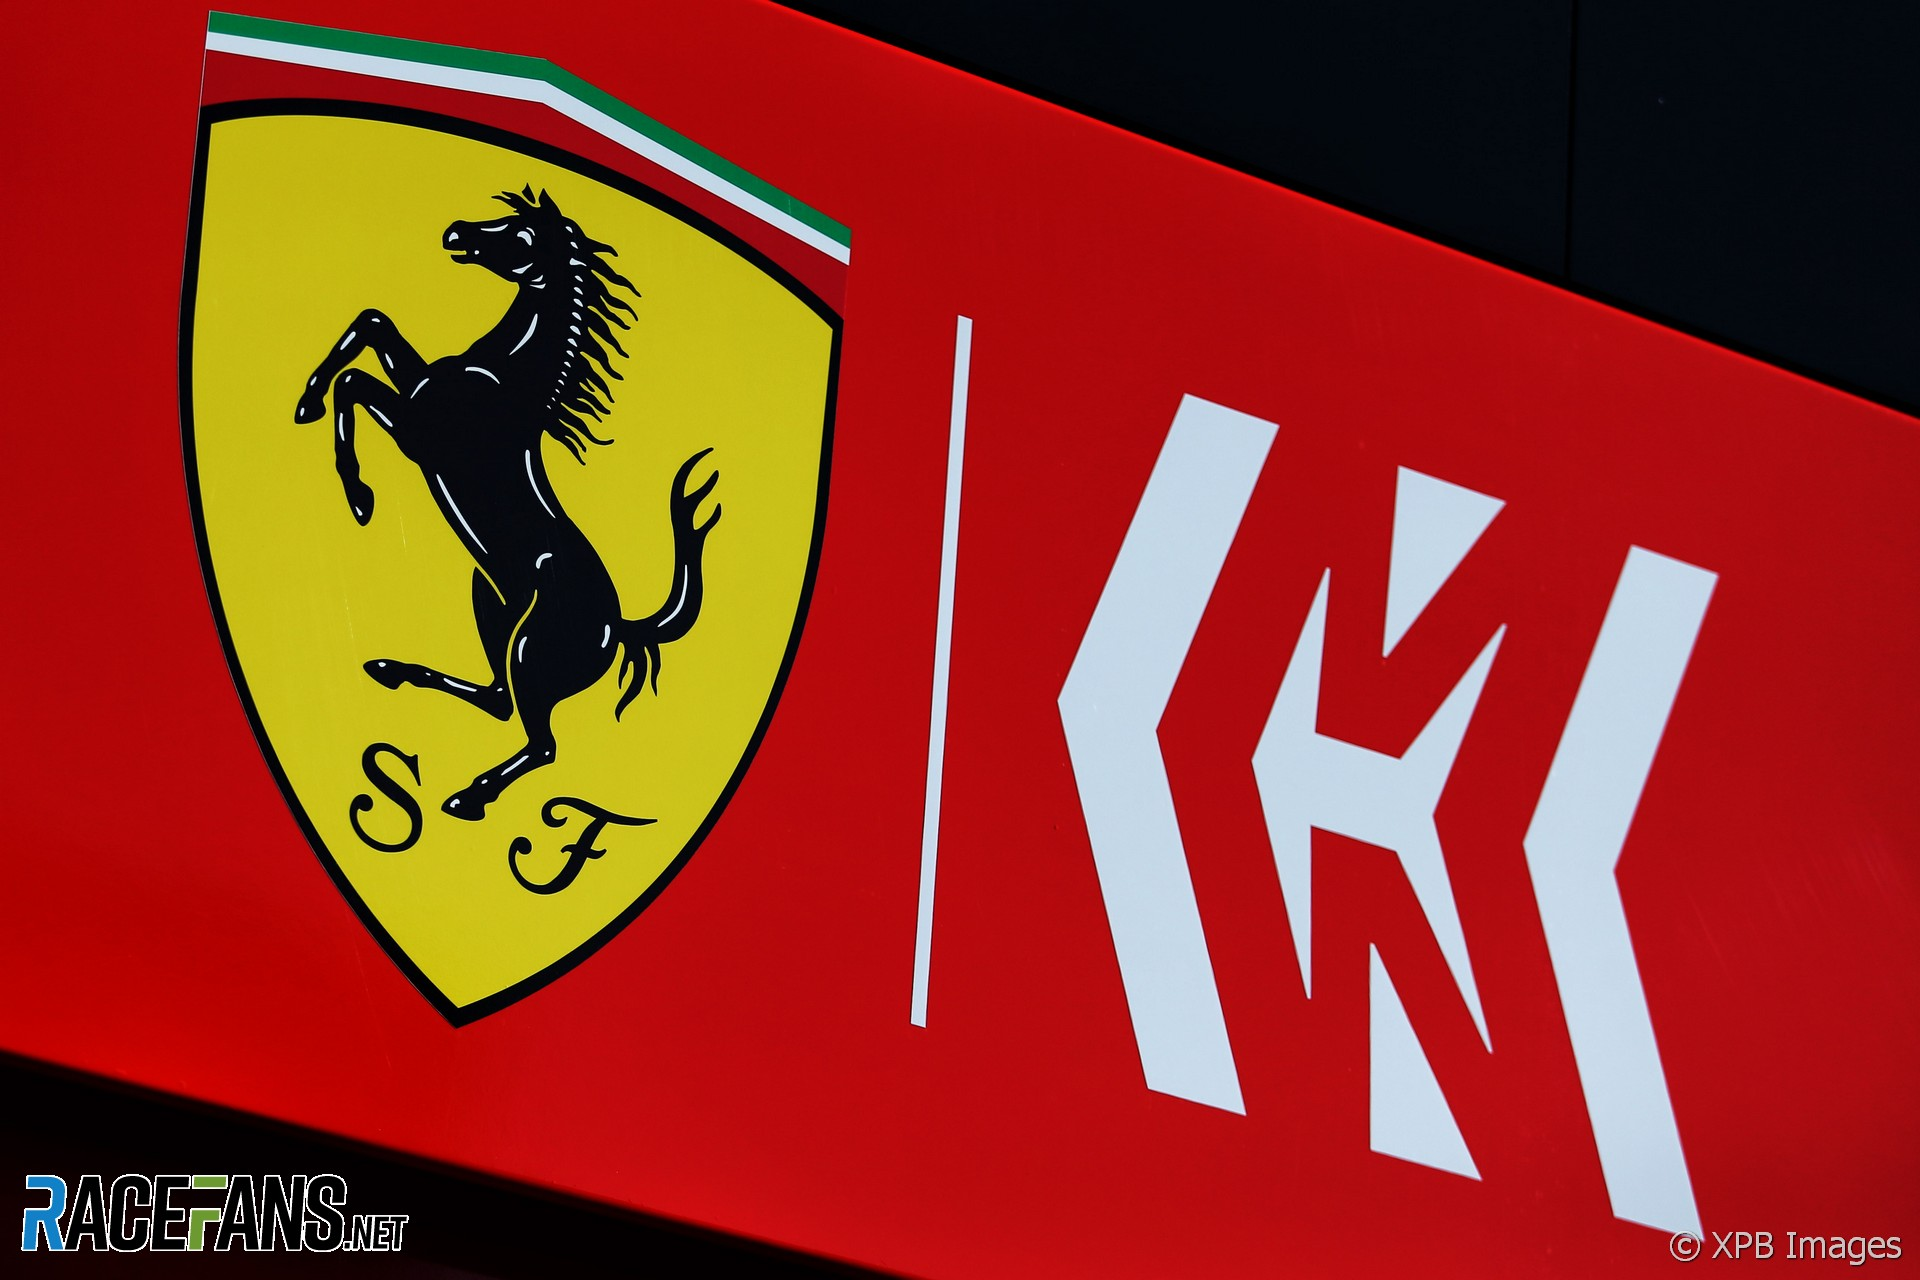 Scuderia Ferrari Mission Winnow Name Returns For Bahrain Gp Racefans